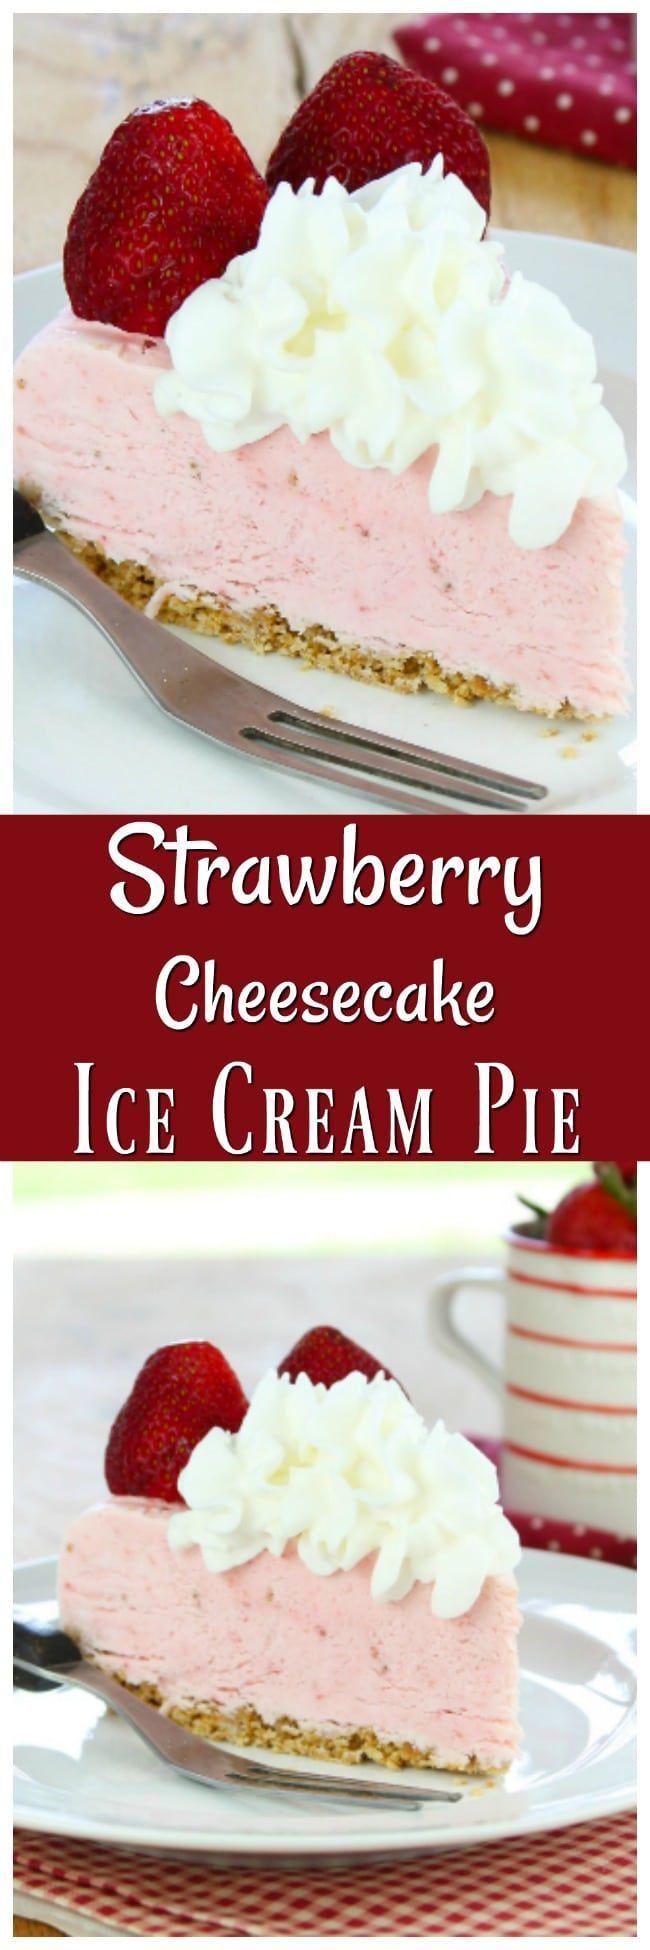 Strawberry Cheesecake Ice Cream Pie ~ Perfect summer dessert #recipe #strawberry #dessert